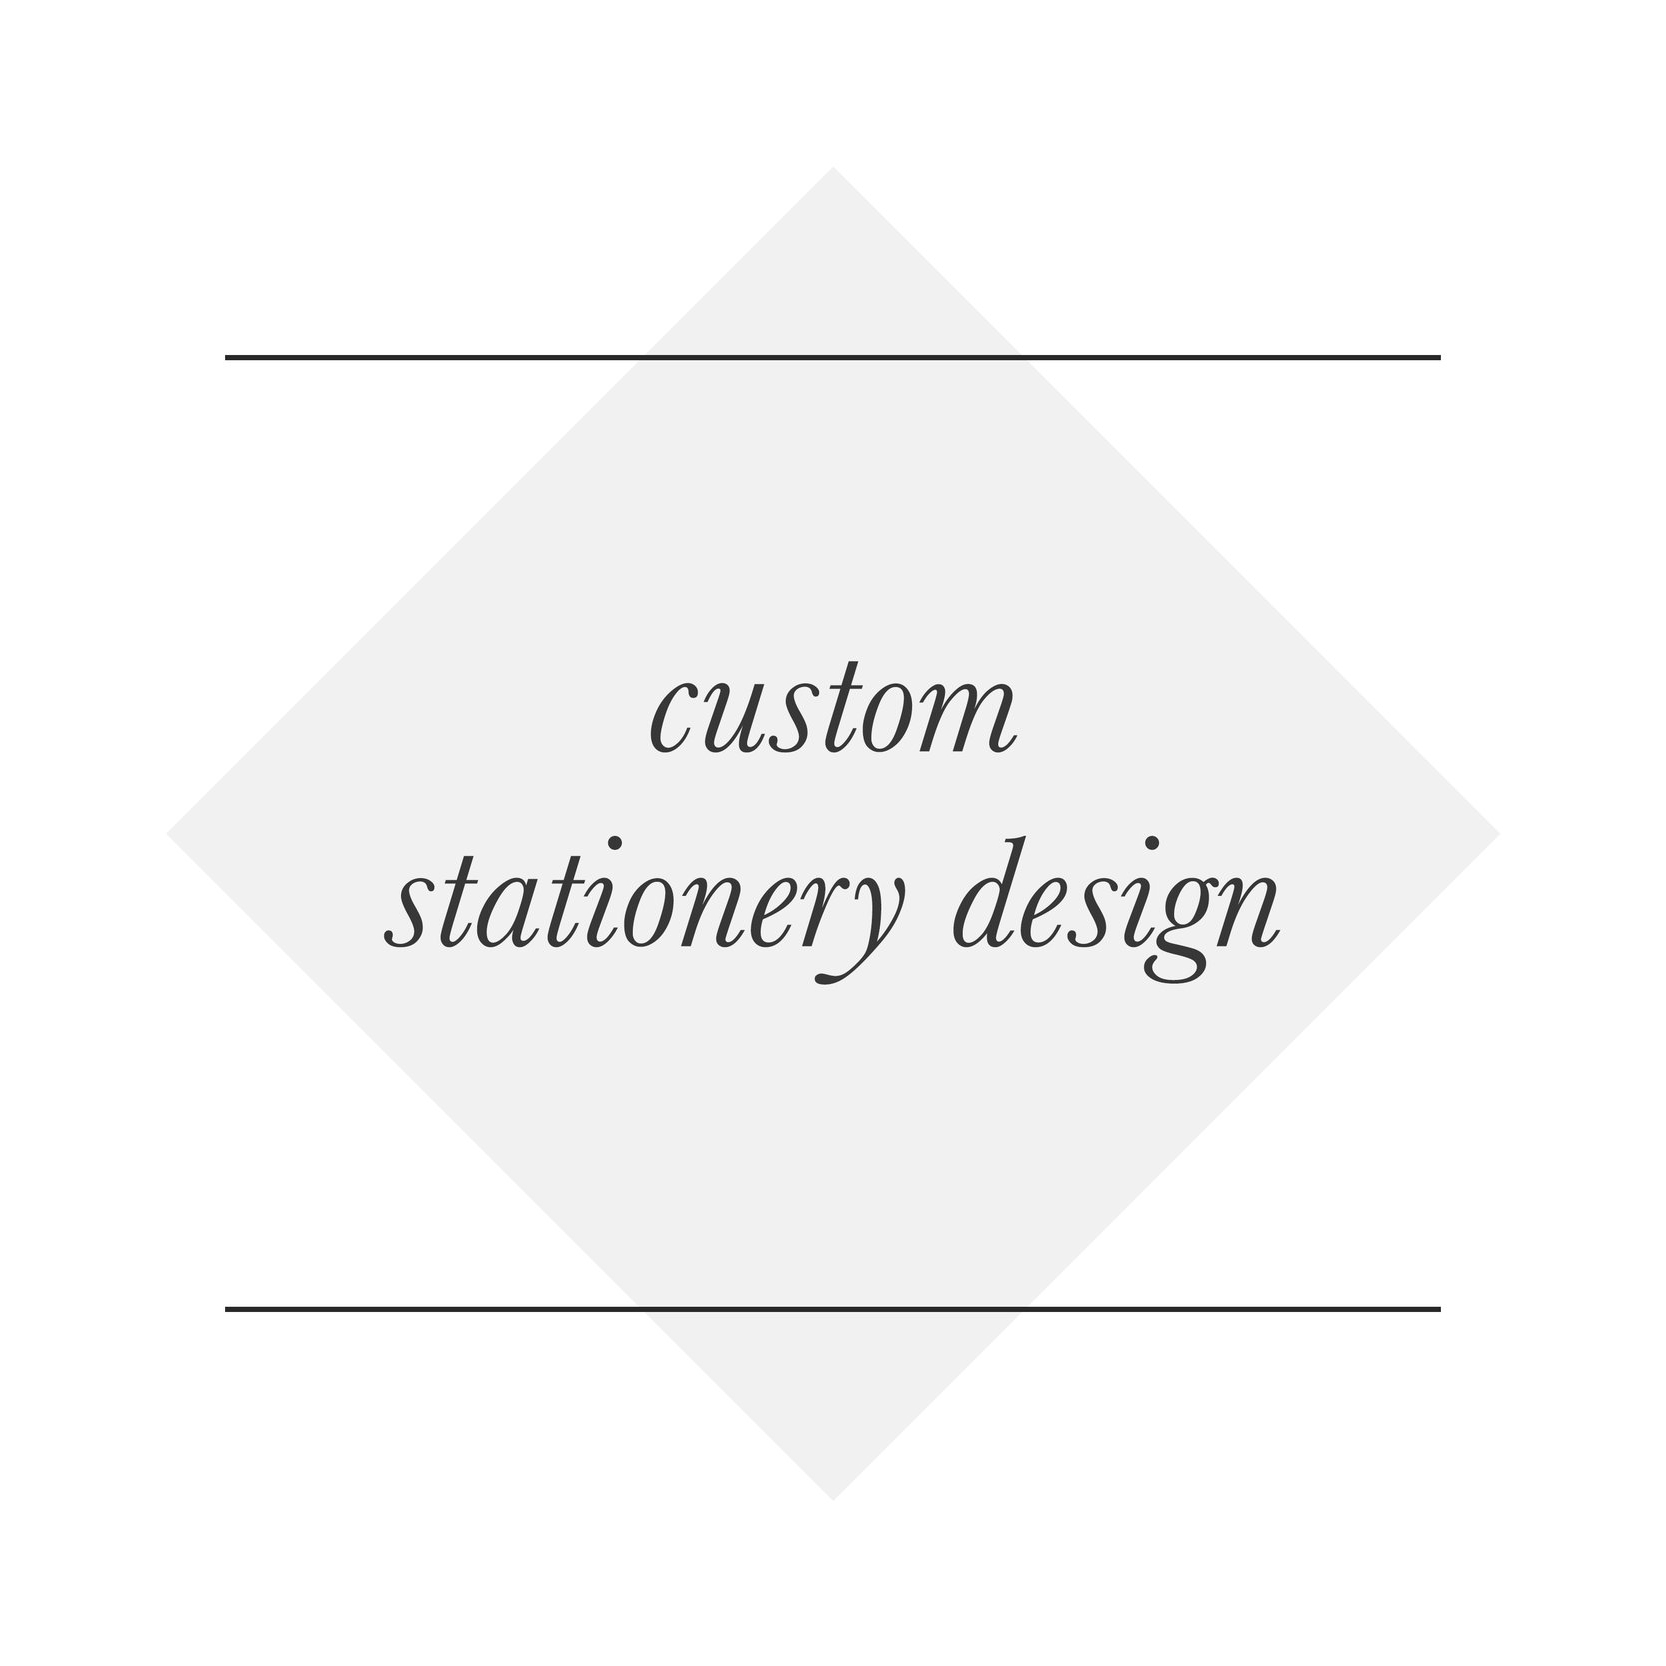 customstationerydesign.jpg